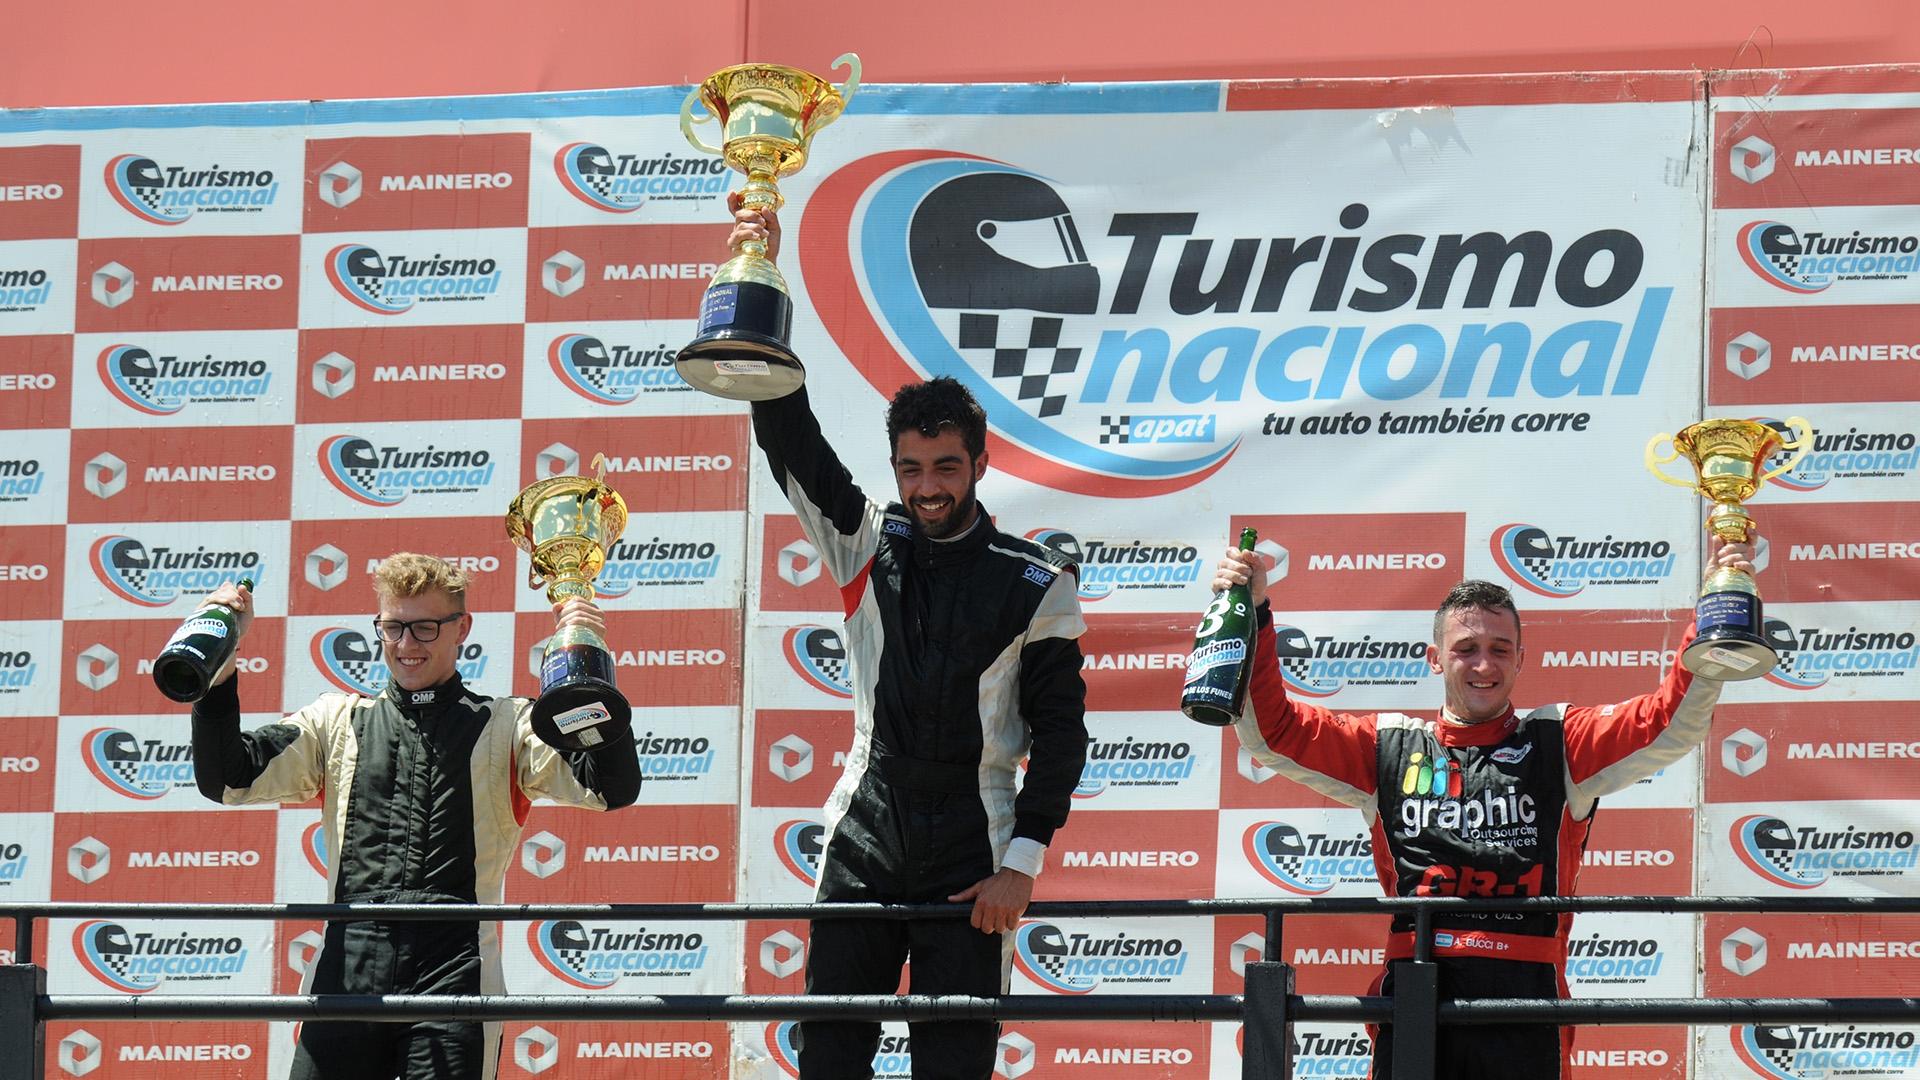 Juan Pablo Pastori debutó como ganador